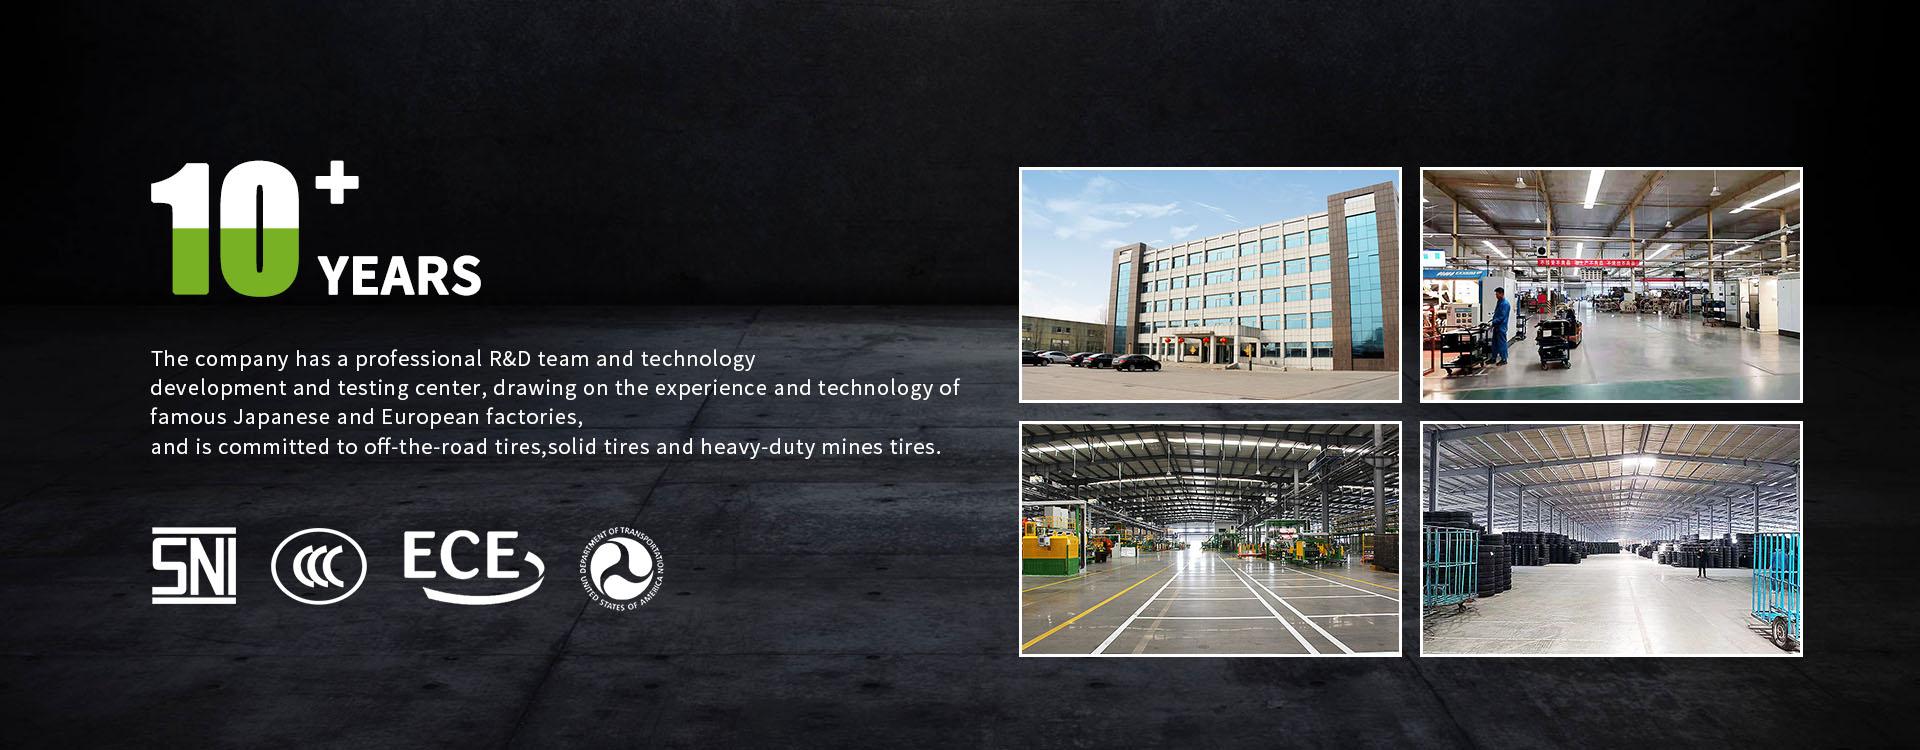 Factory of Mining Tire, Truck Tyre, OTR Tire